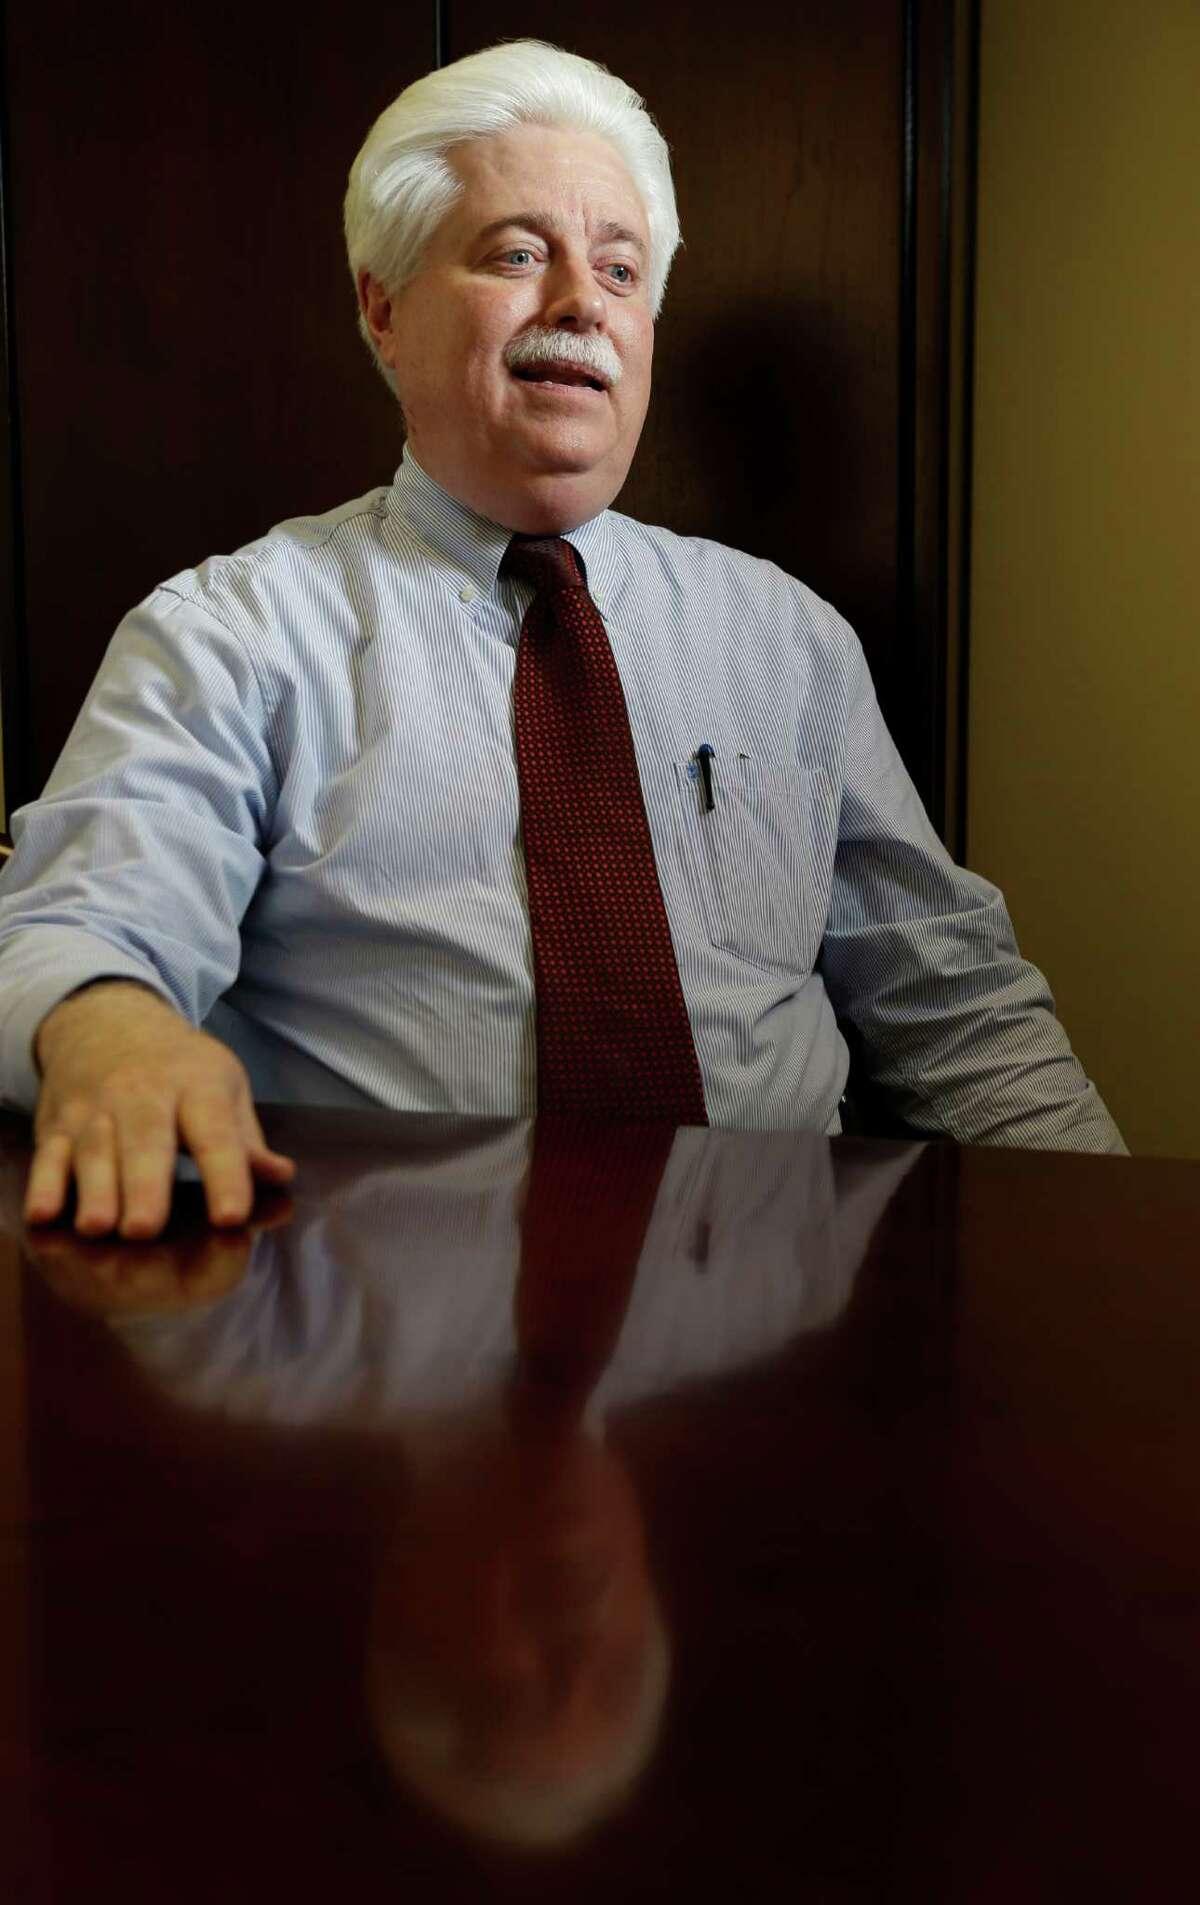 Stan Stanart, Harris County County Clerk, talks in his office at 201 Caroline Wednesday, Jan. 13, 2016, in Houston. ( Melissa Phillip / Houston Chronicle )